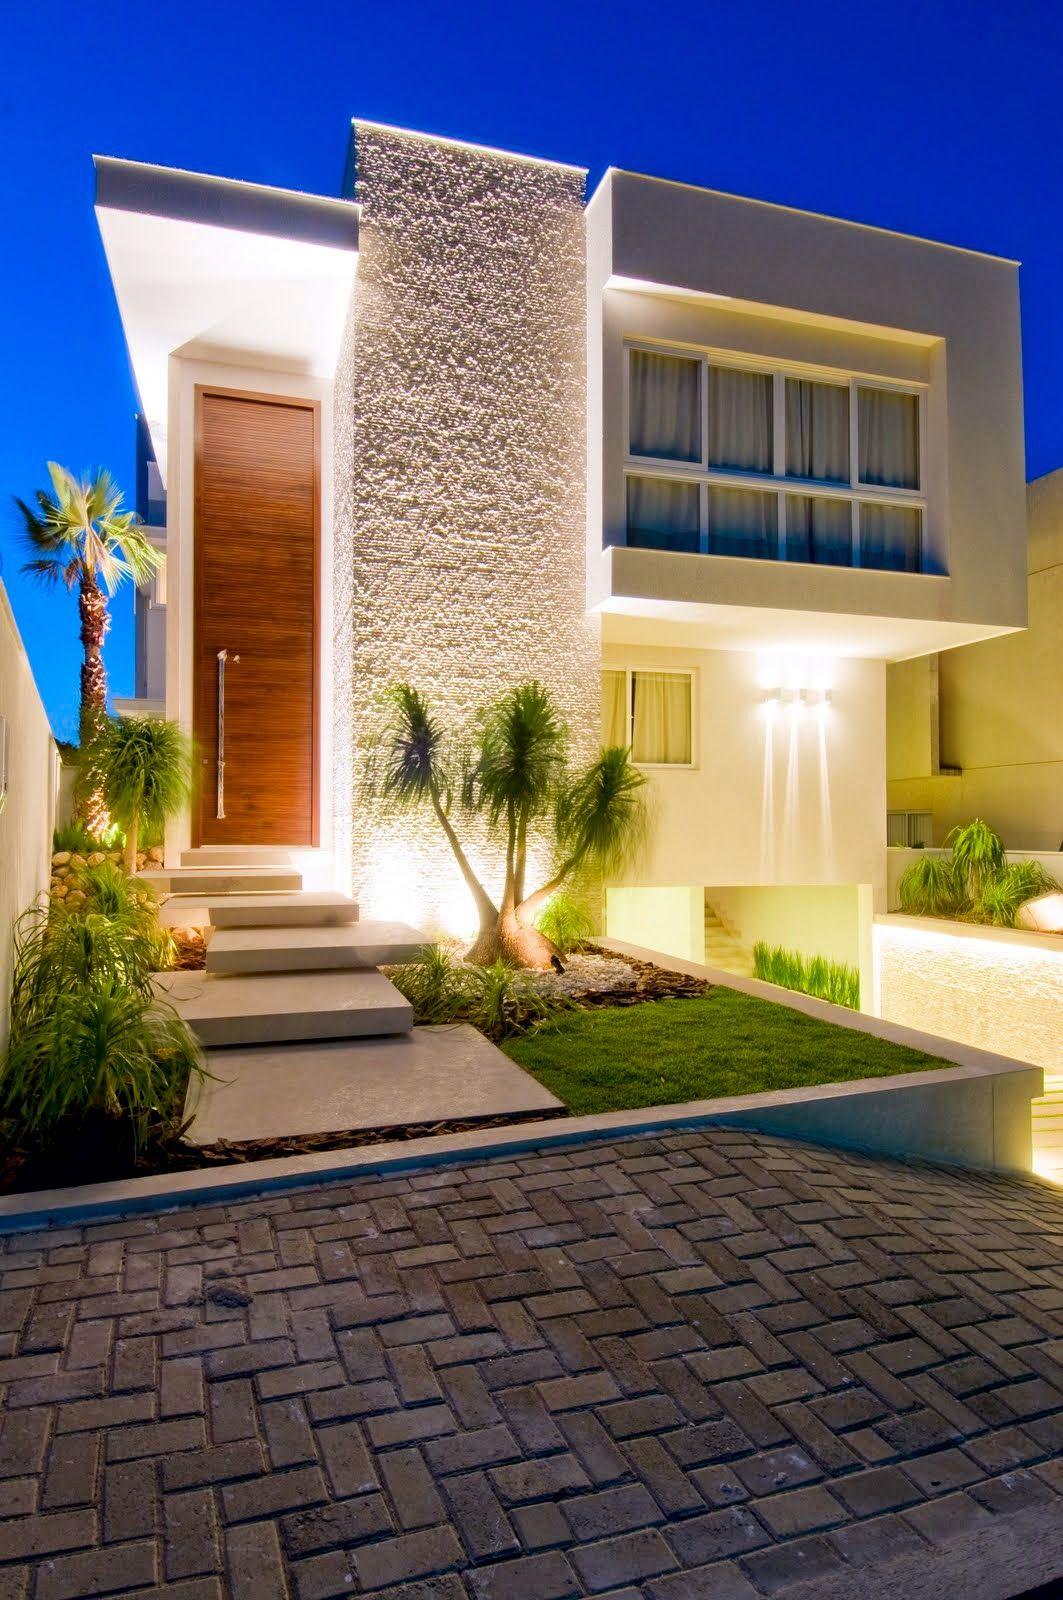 Casas homedesign arquitetura 20 fachadas de casas for Modelos de casas modernas